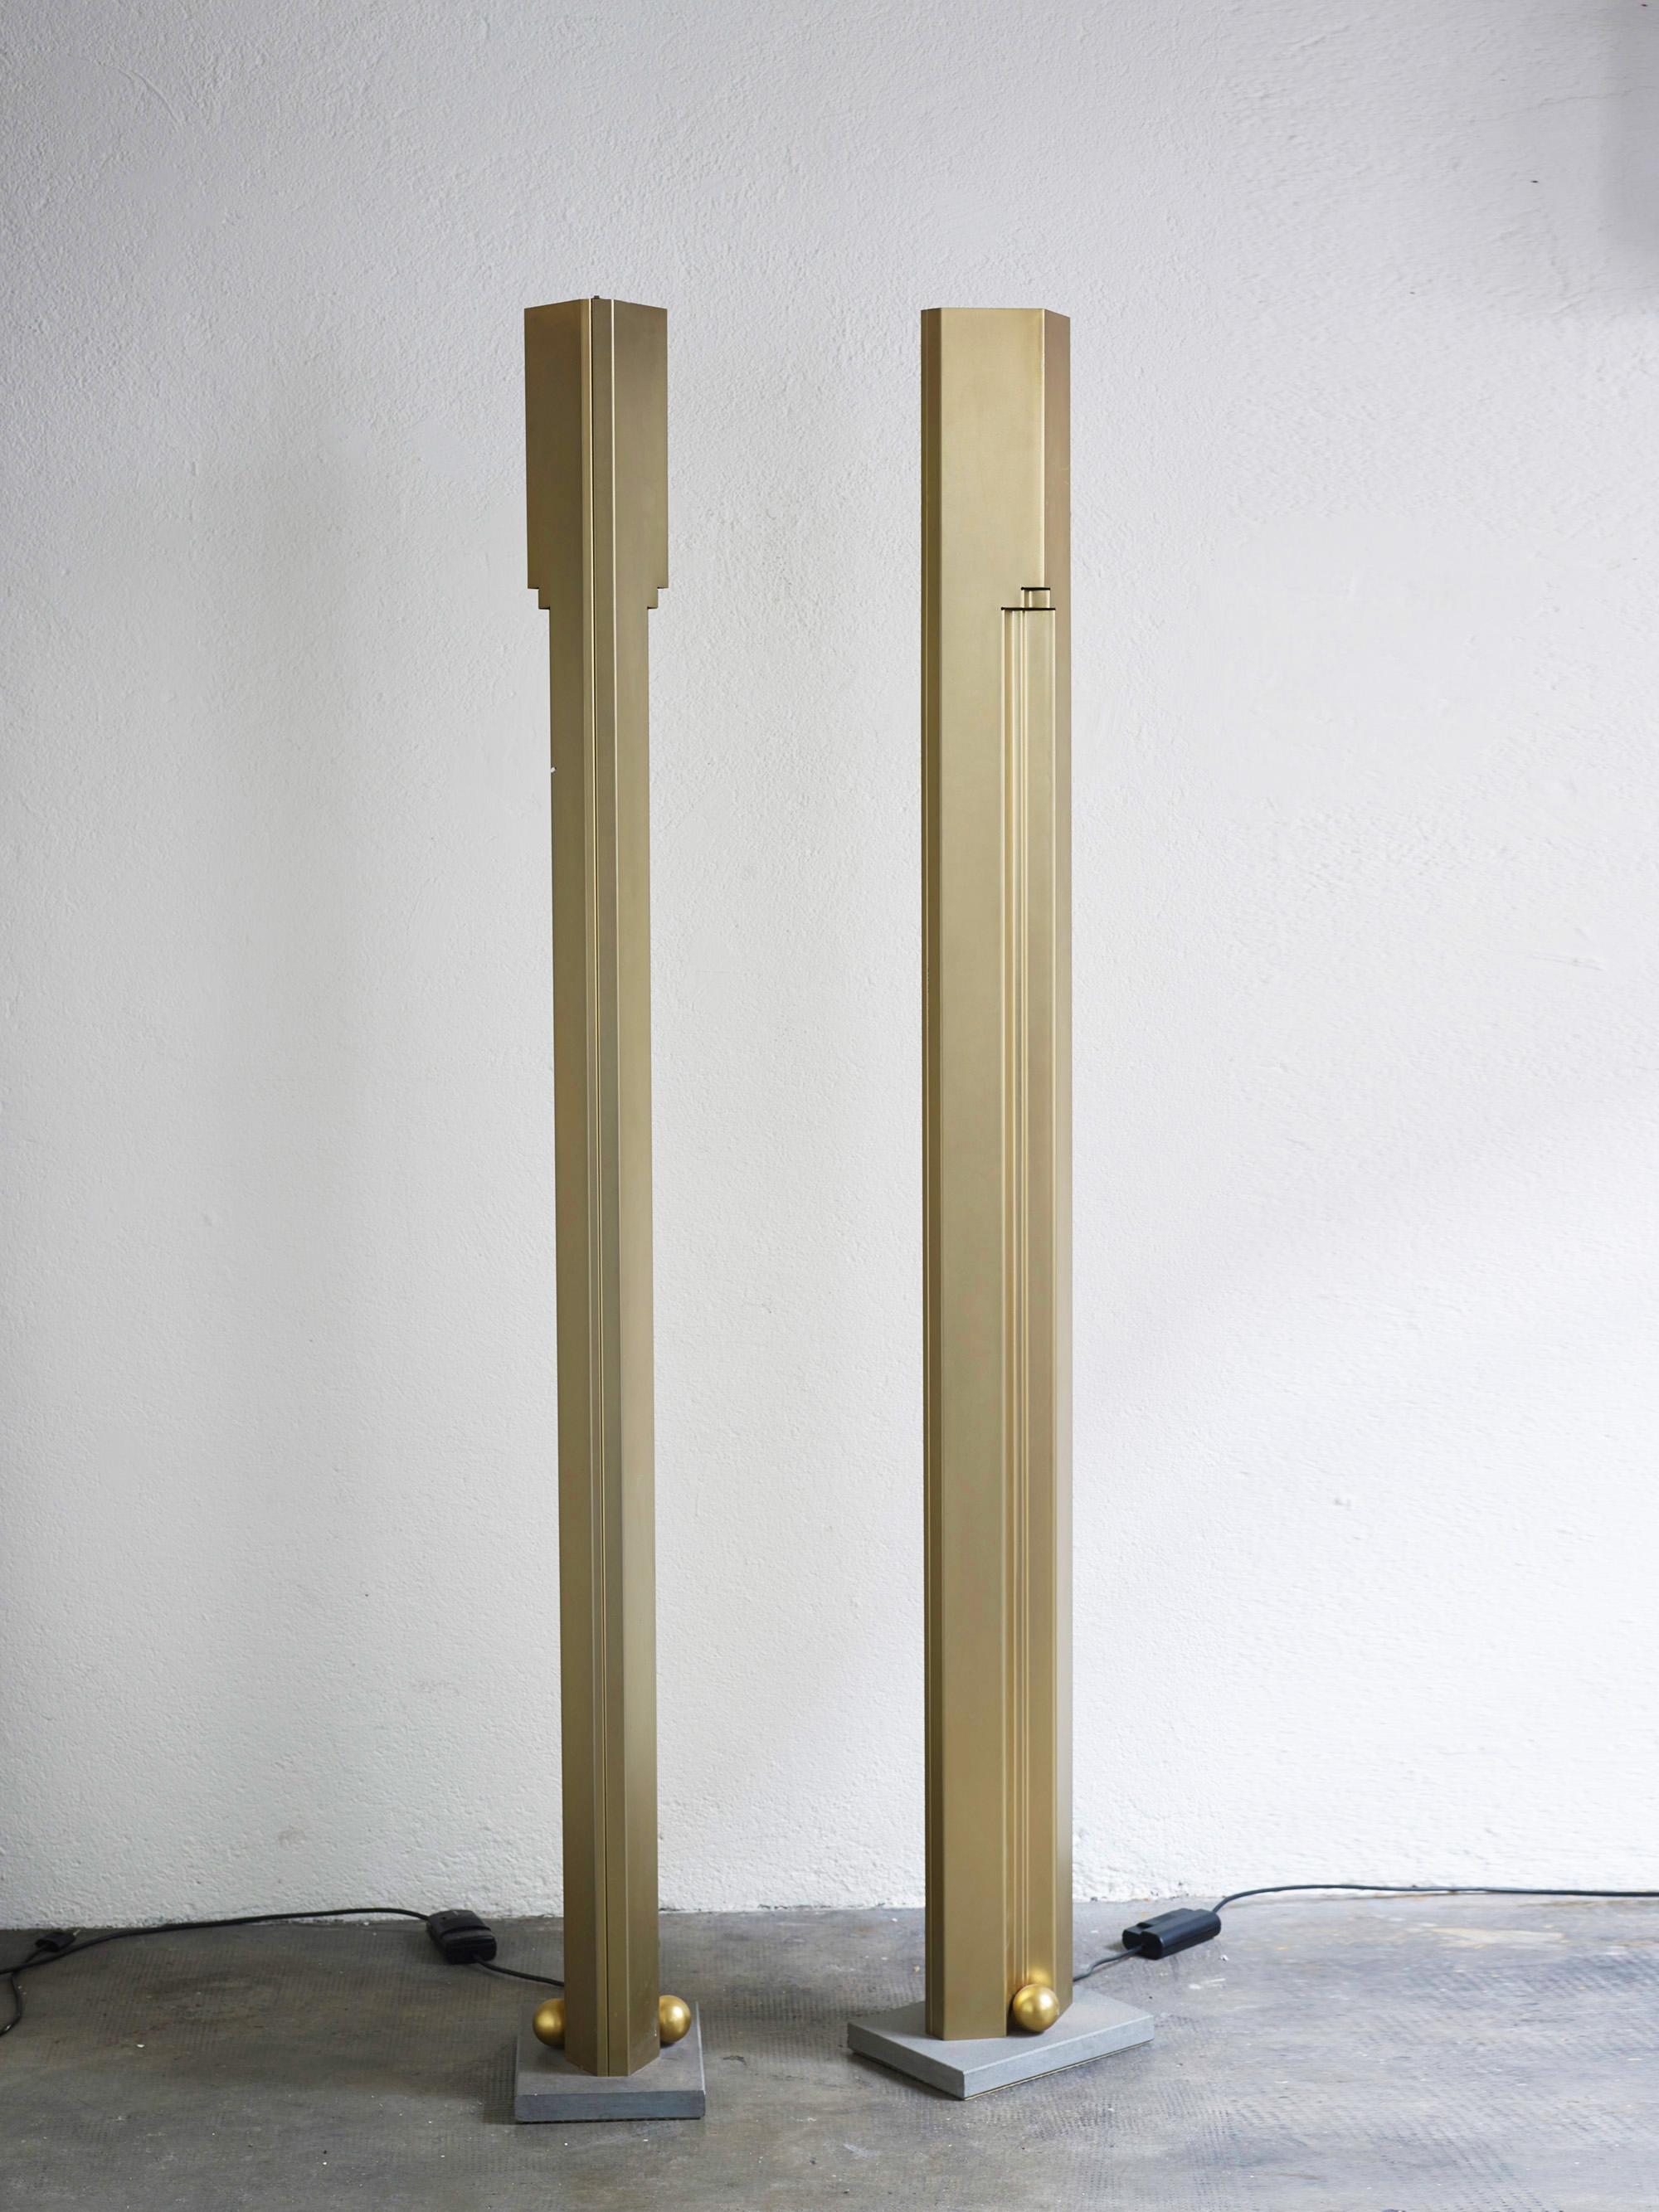 totem-floor-lamp-by-kazuhide-takahama-image-01